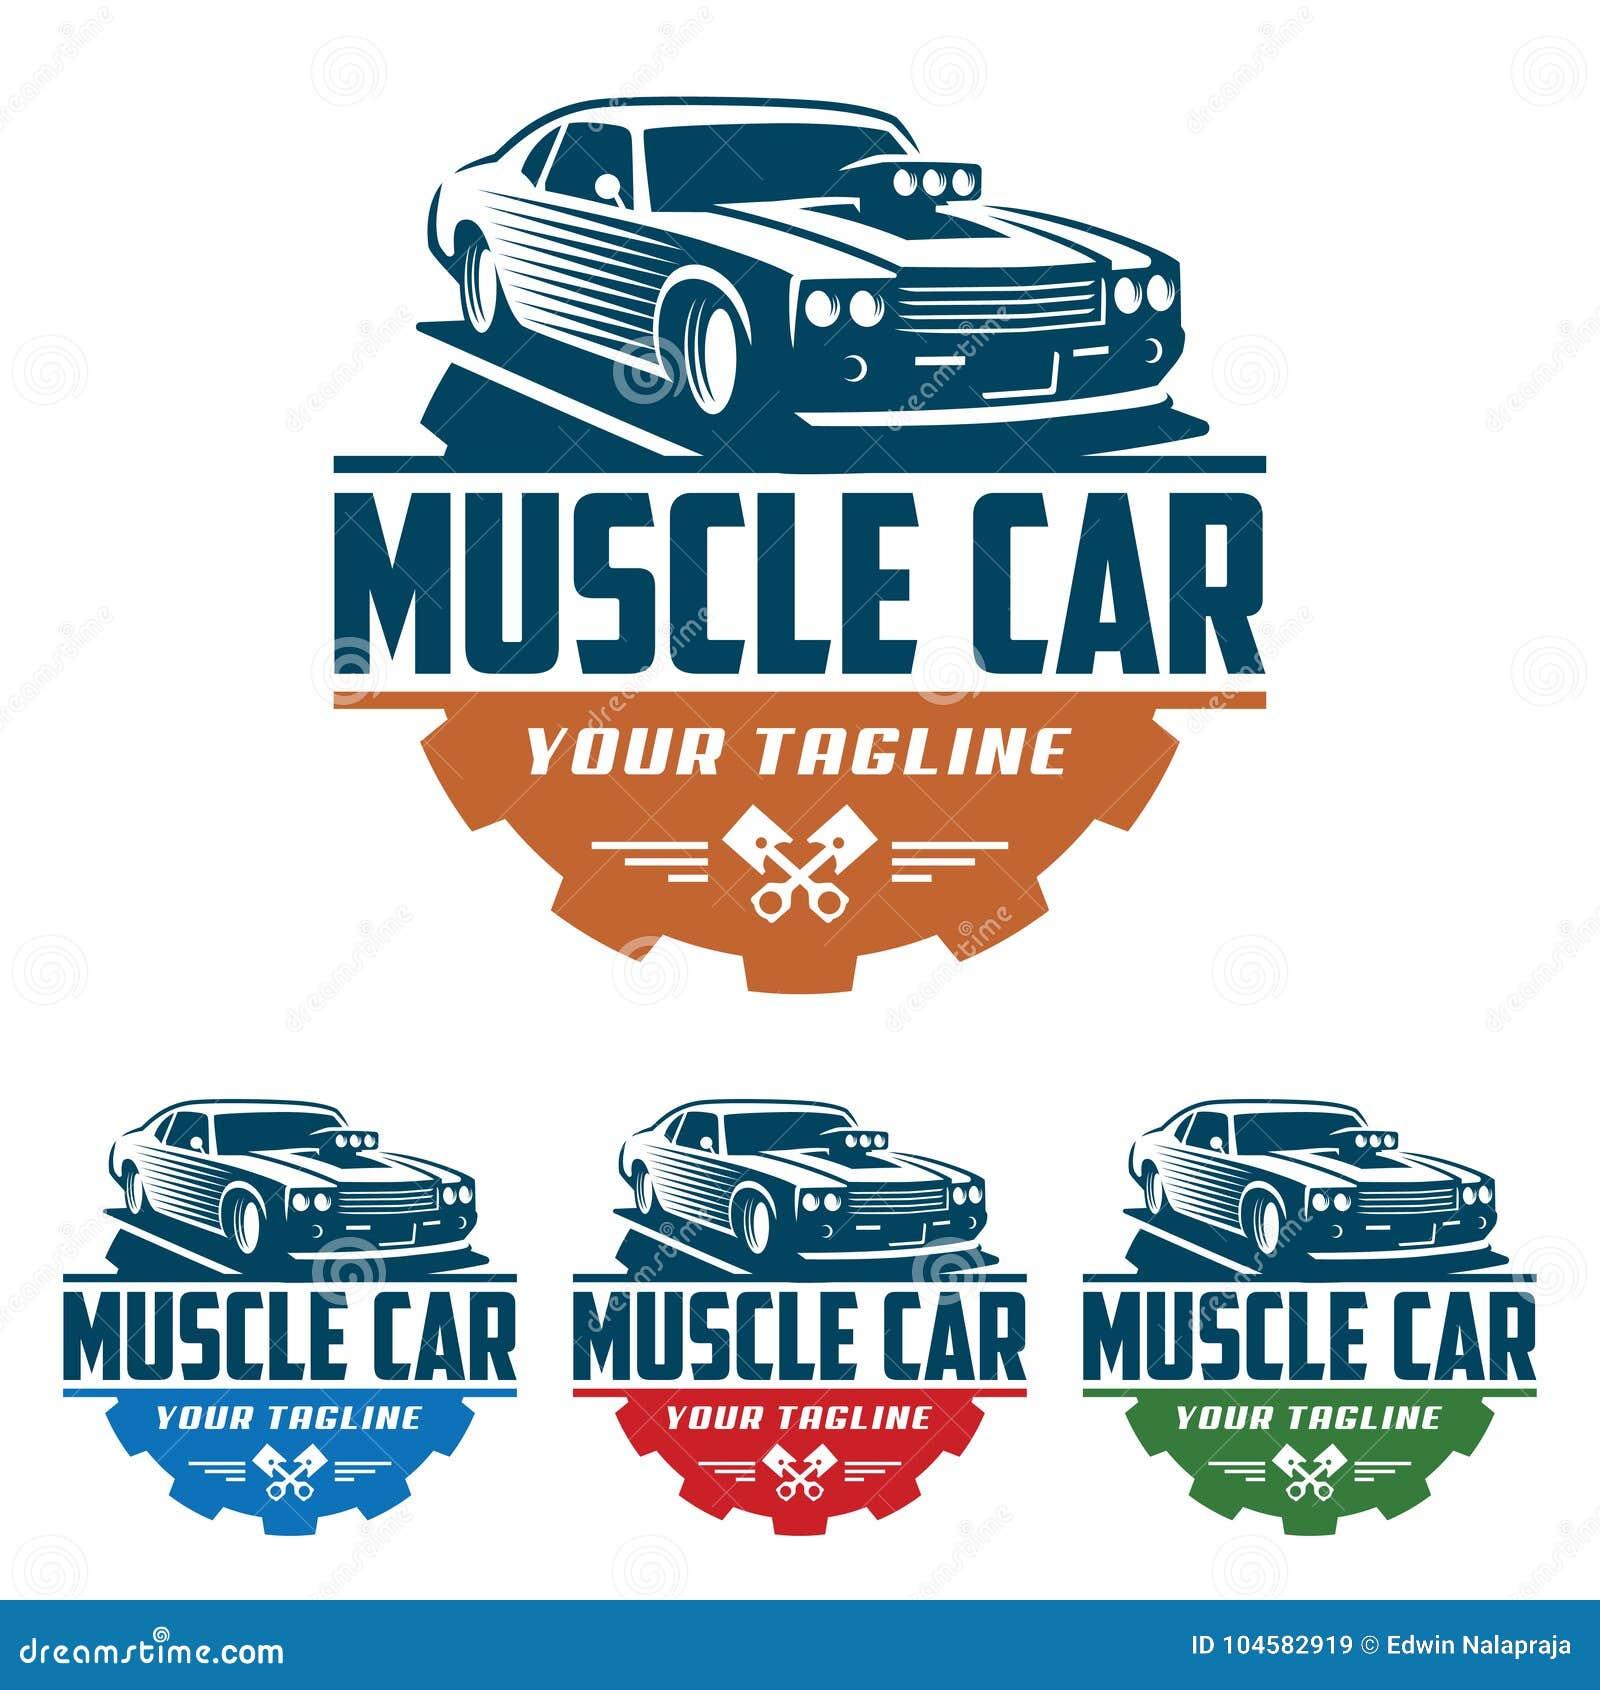 Muscle car logo, retro logo style, vintage logo